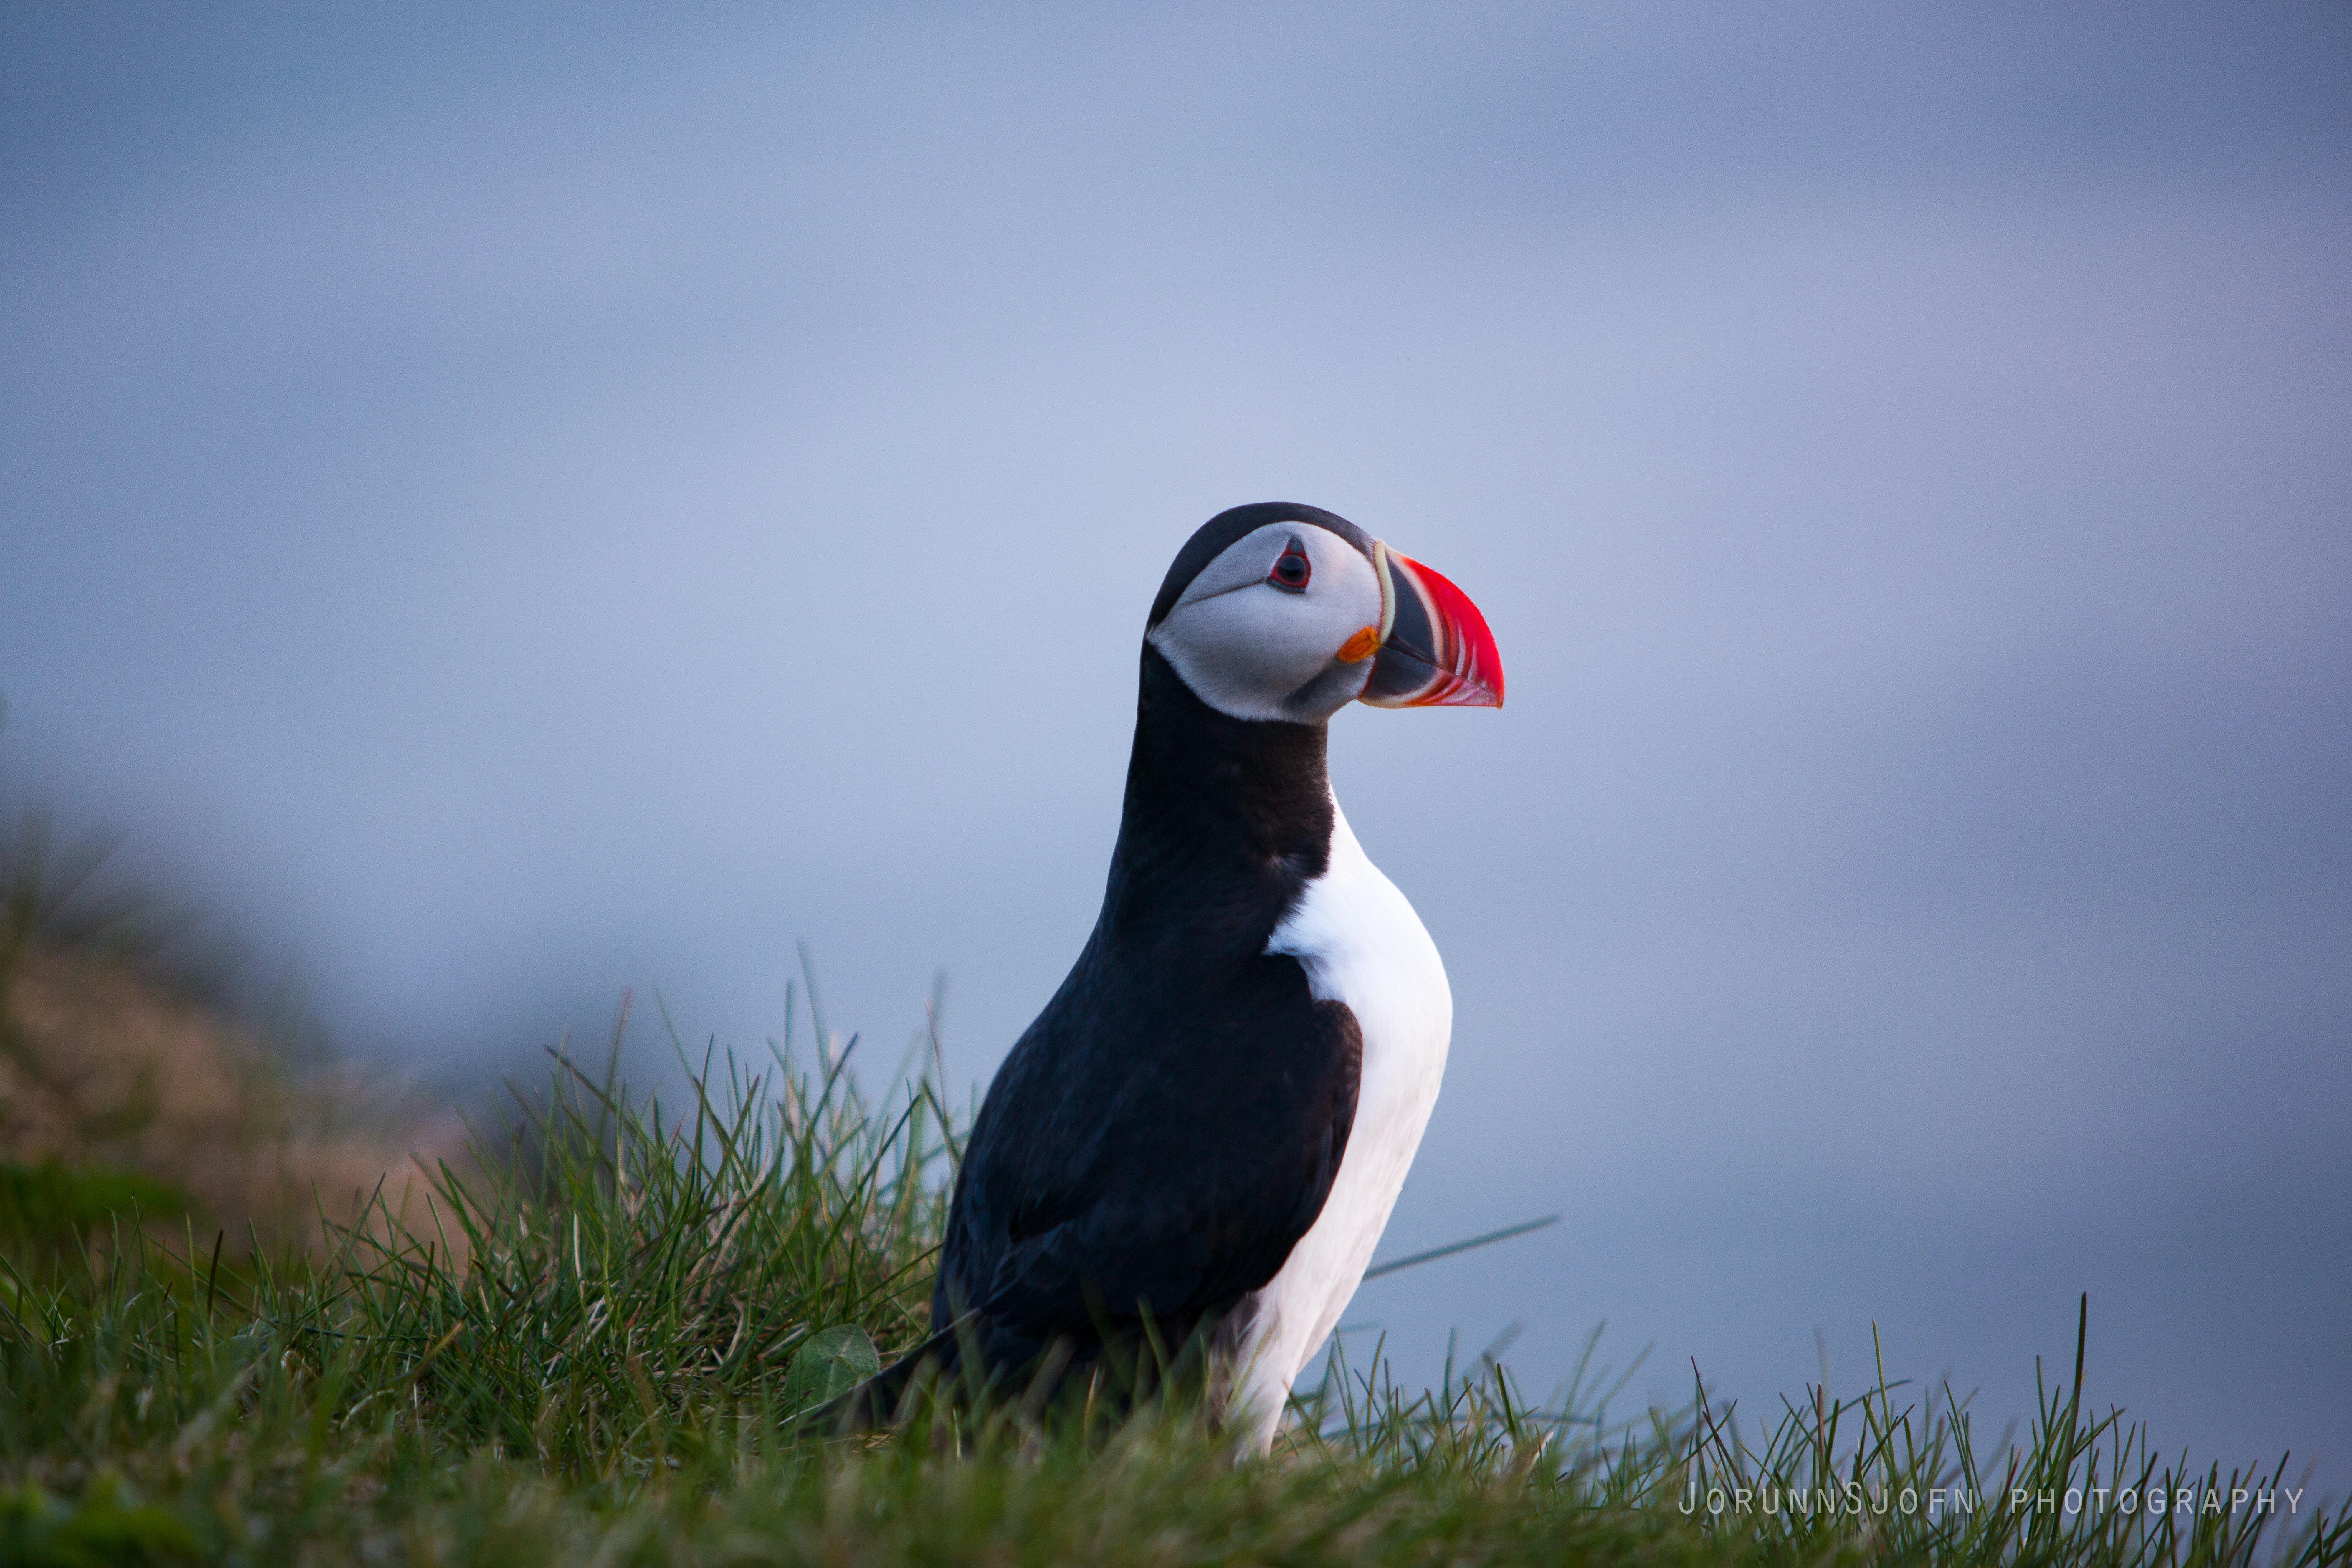 Puffin birds in Iceland